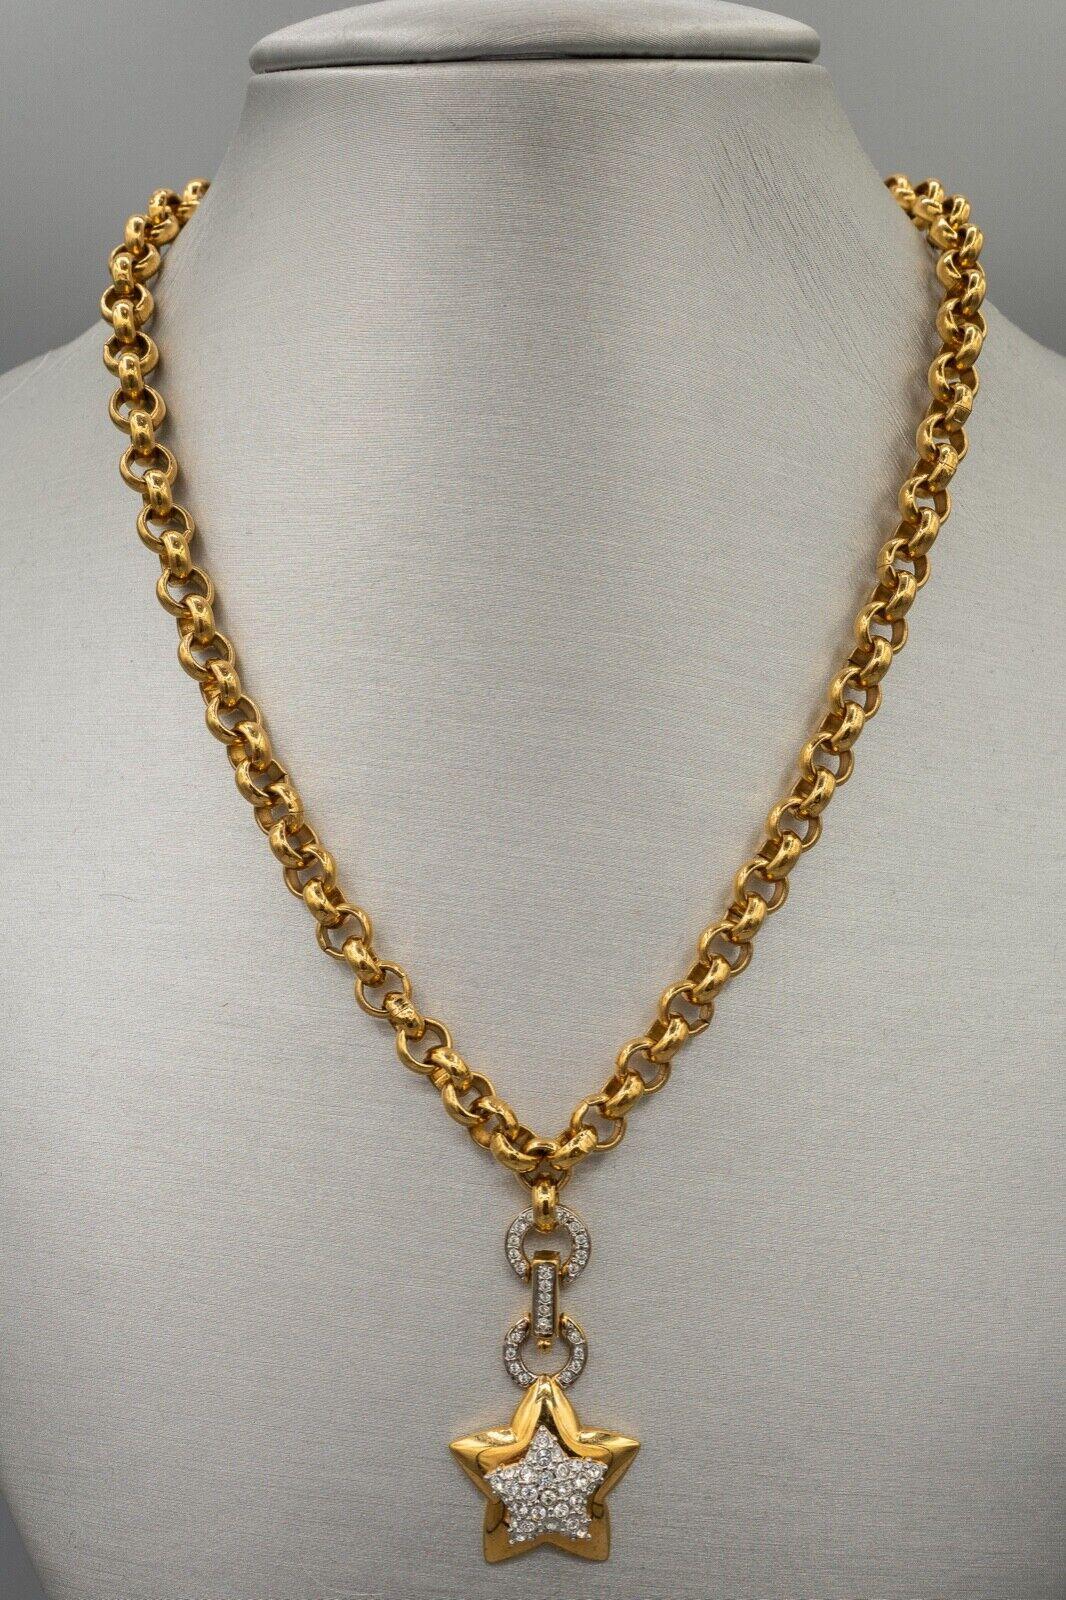 Swarovski Crystal Necklace, Gold Tone Star Pendan… - image 1